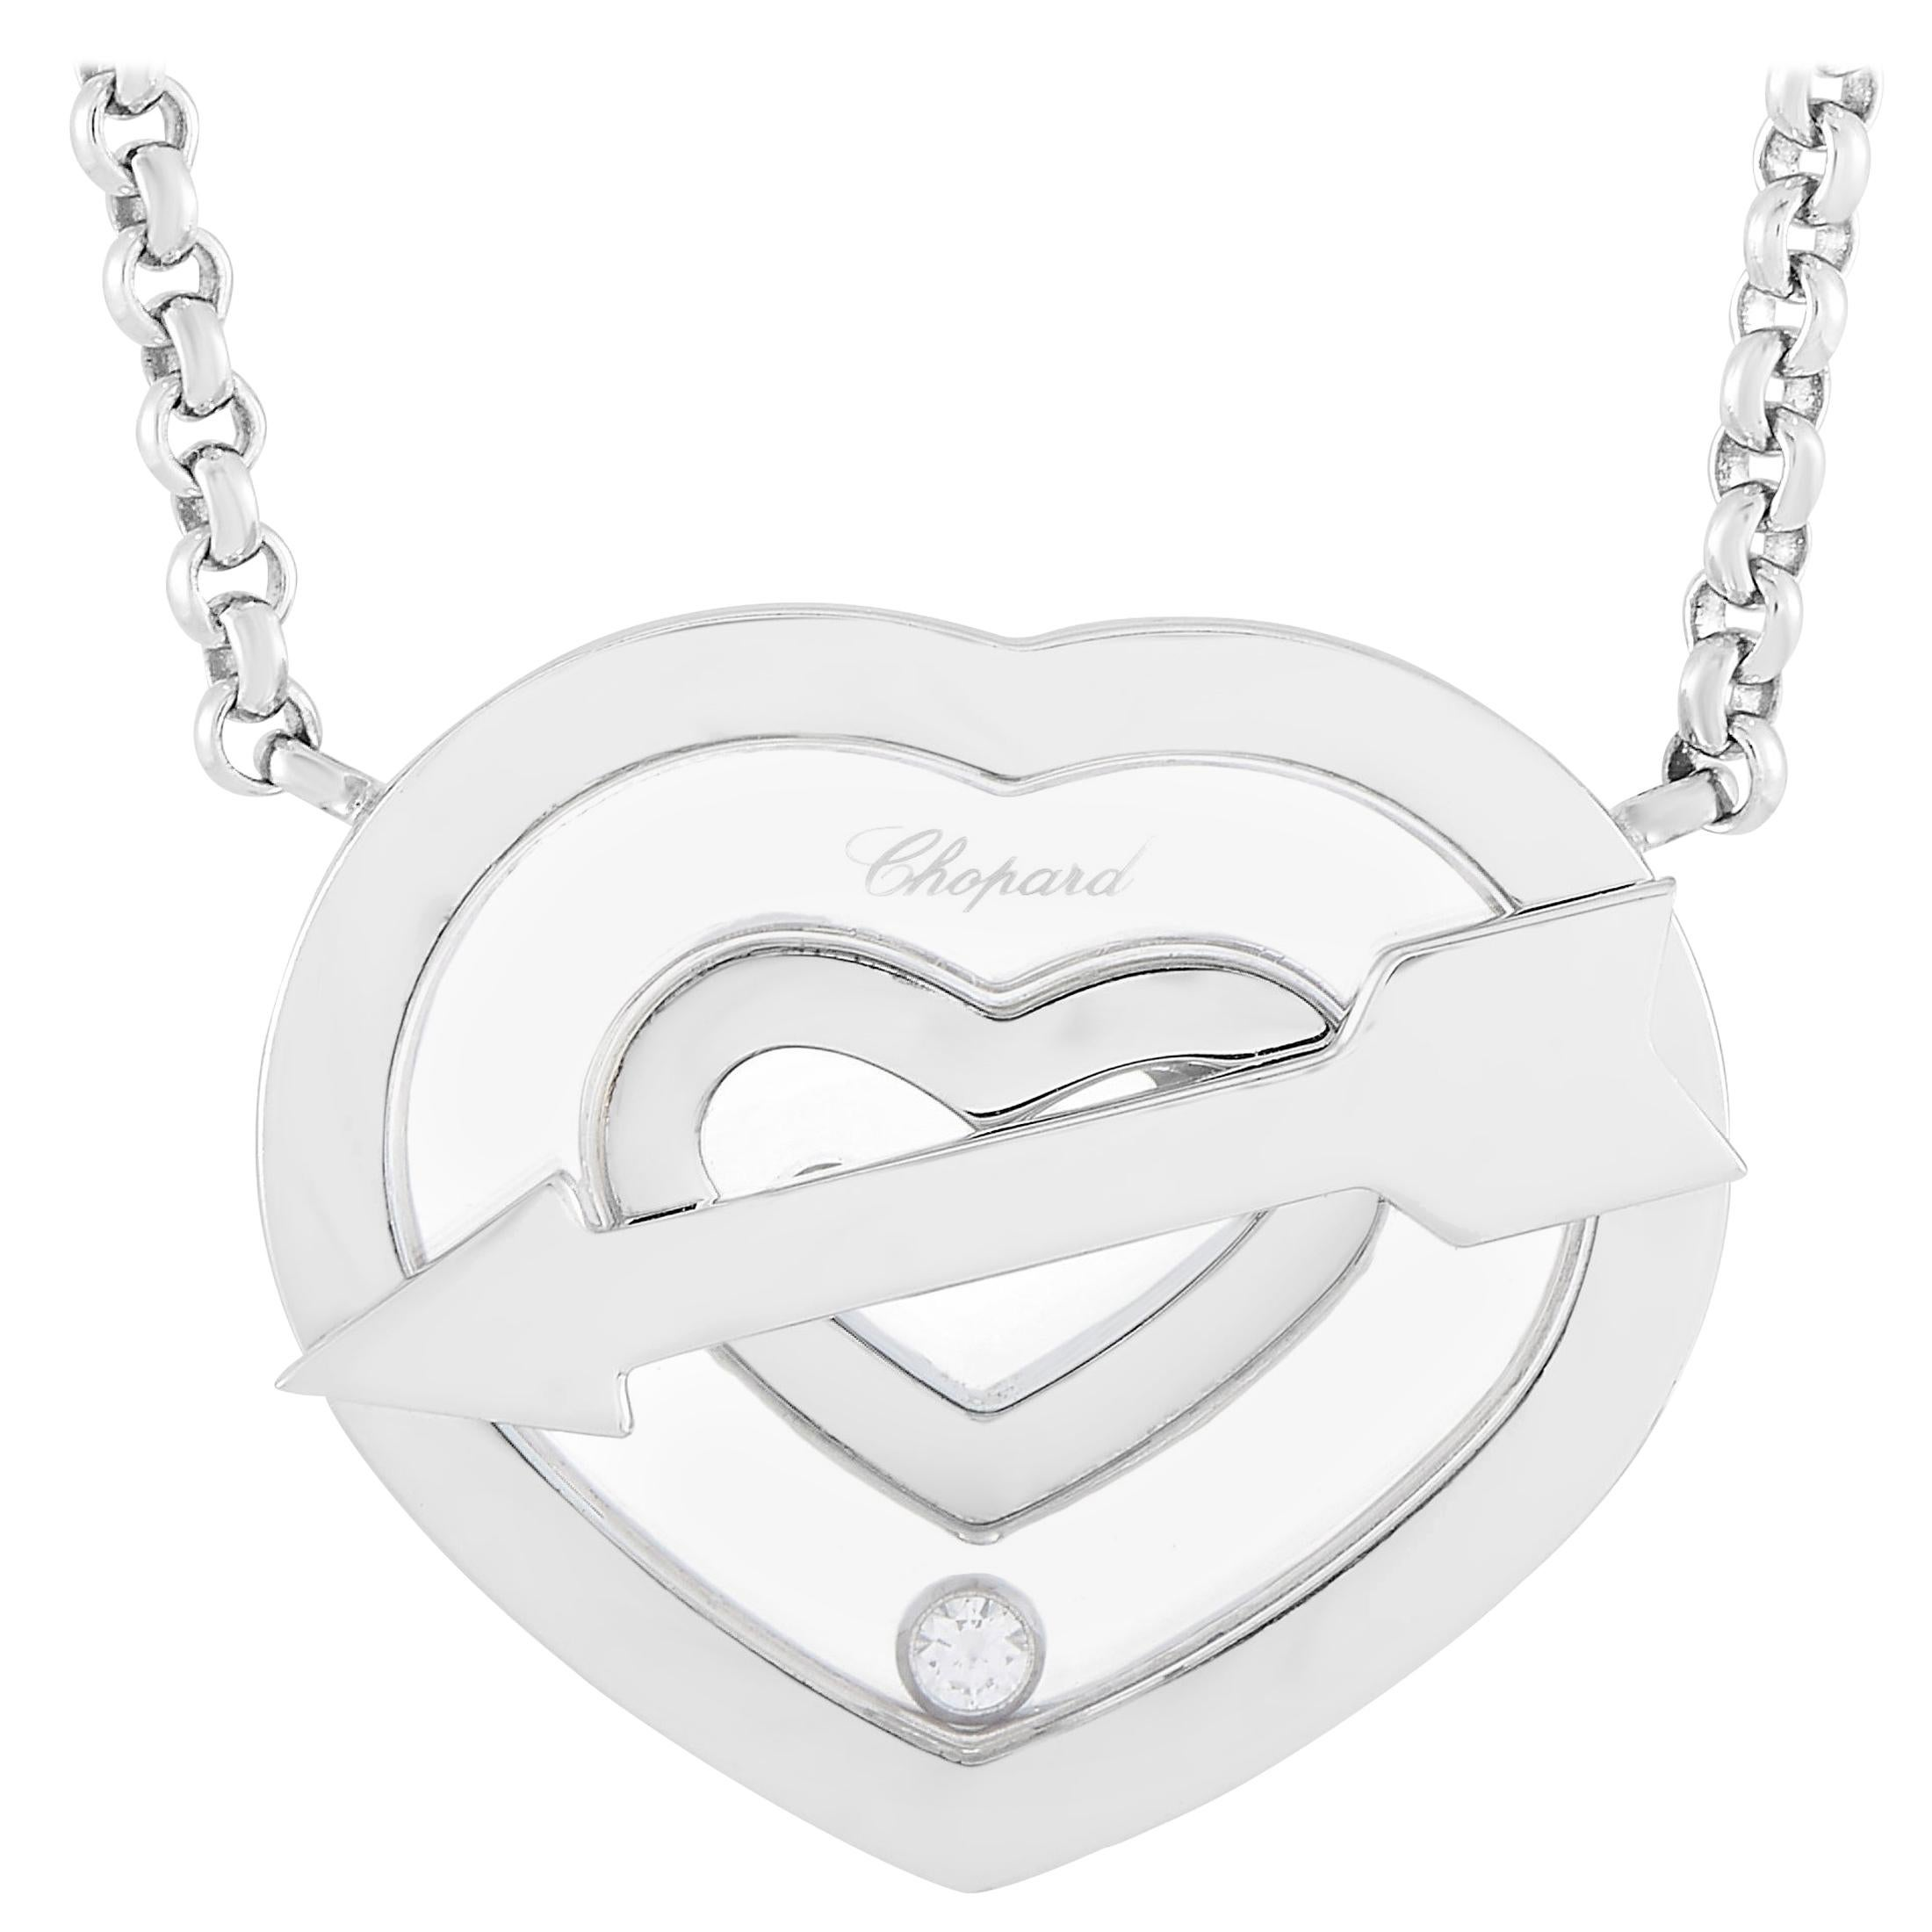 Chopard Happy Diamonds 18 Karat White Gold Diamond Heart Pendant Necklace